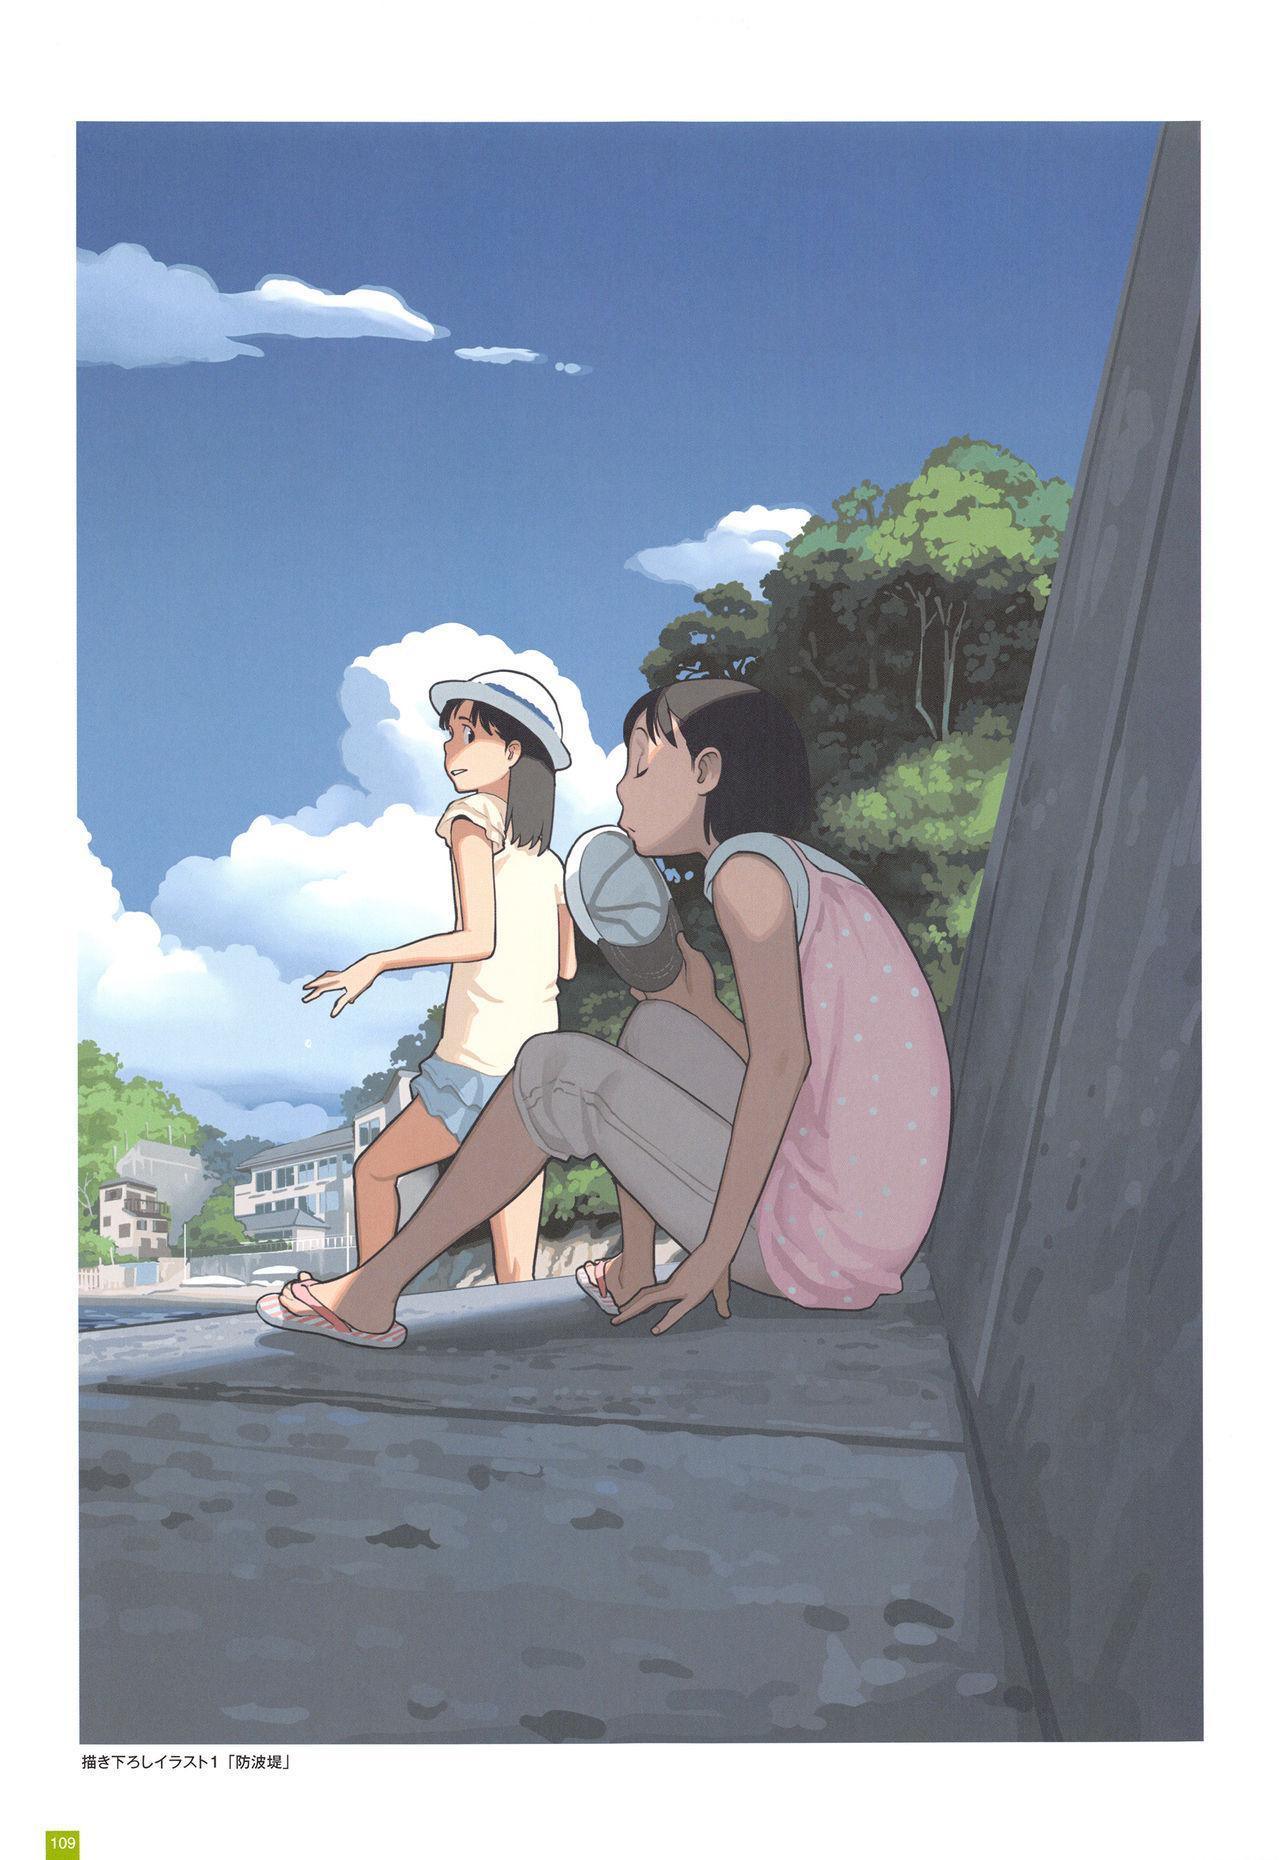 LO Artbook 2-A TAKAMICHI LOOP WORKS 111